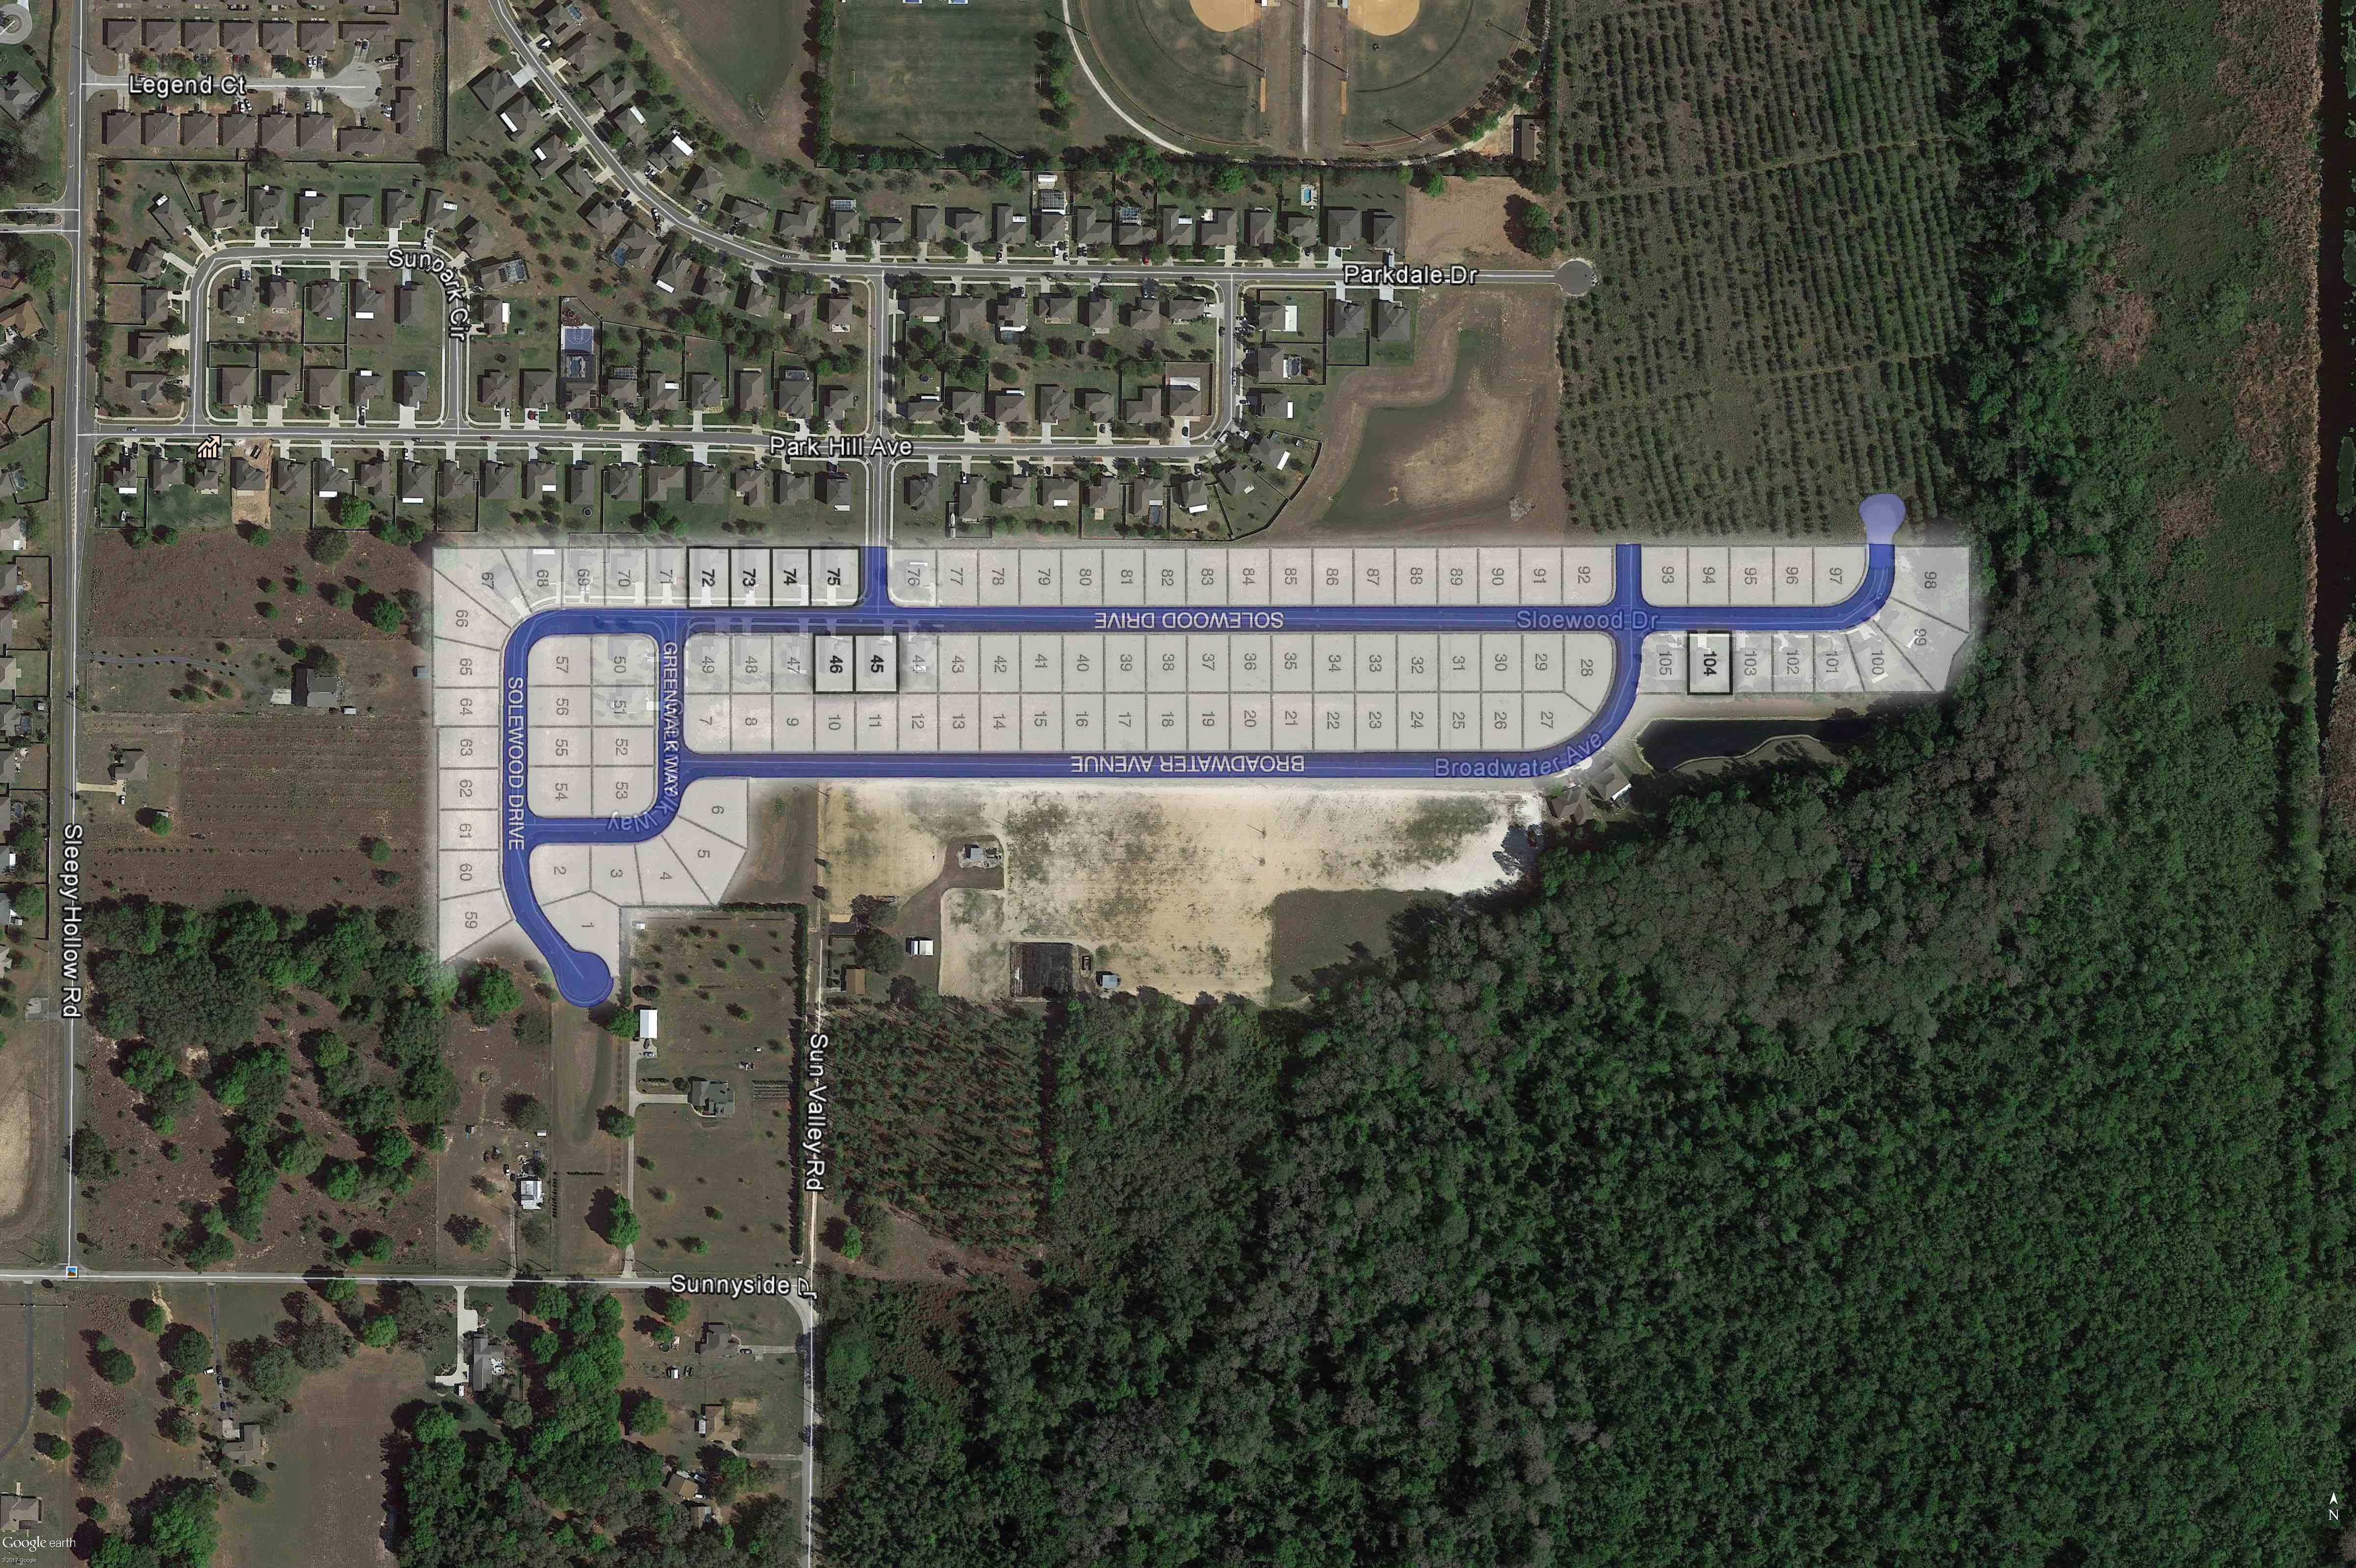 Park Hill Google Earth Aerial_site plan overlay